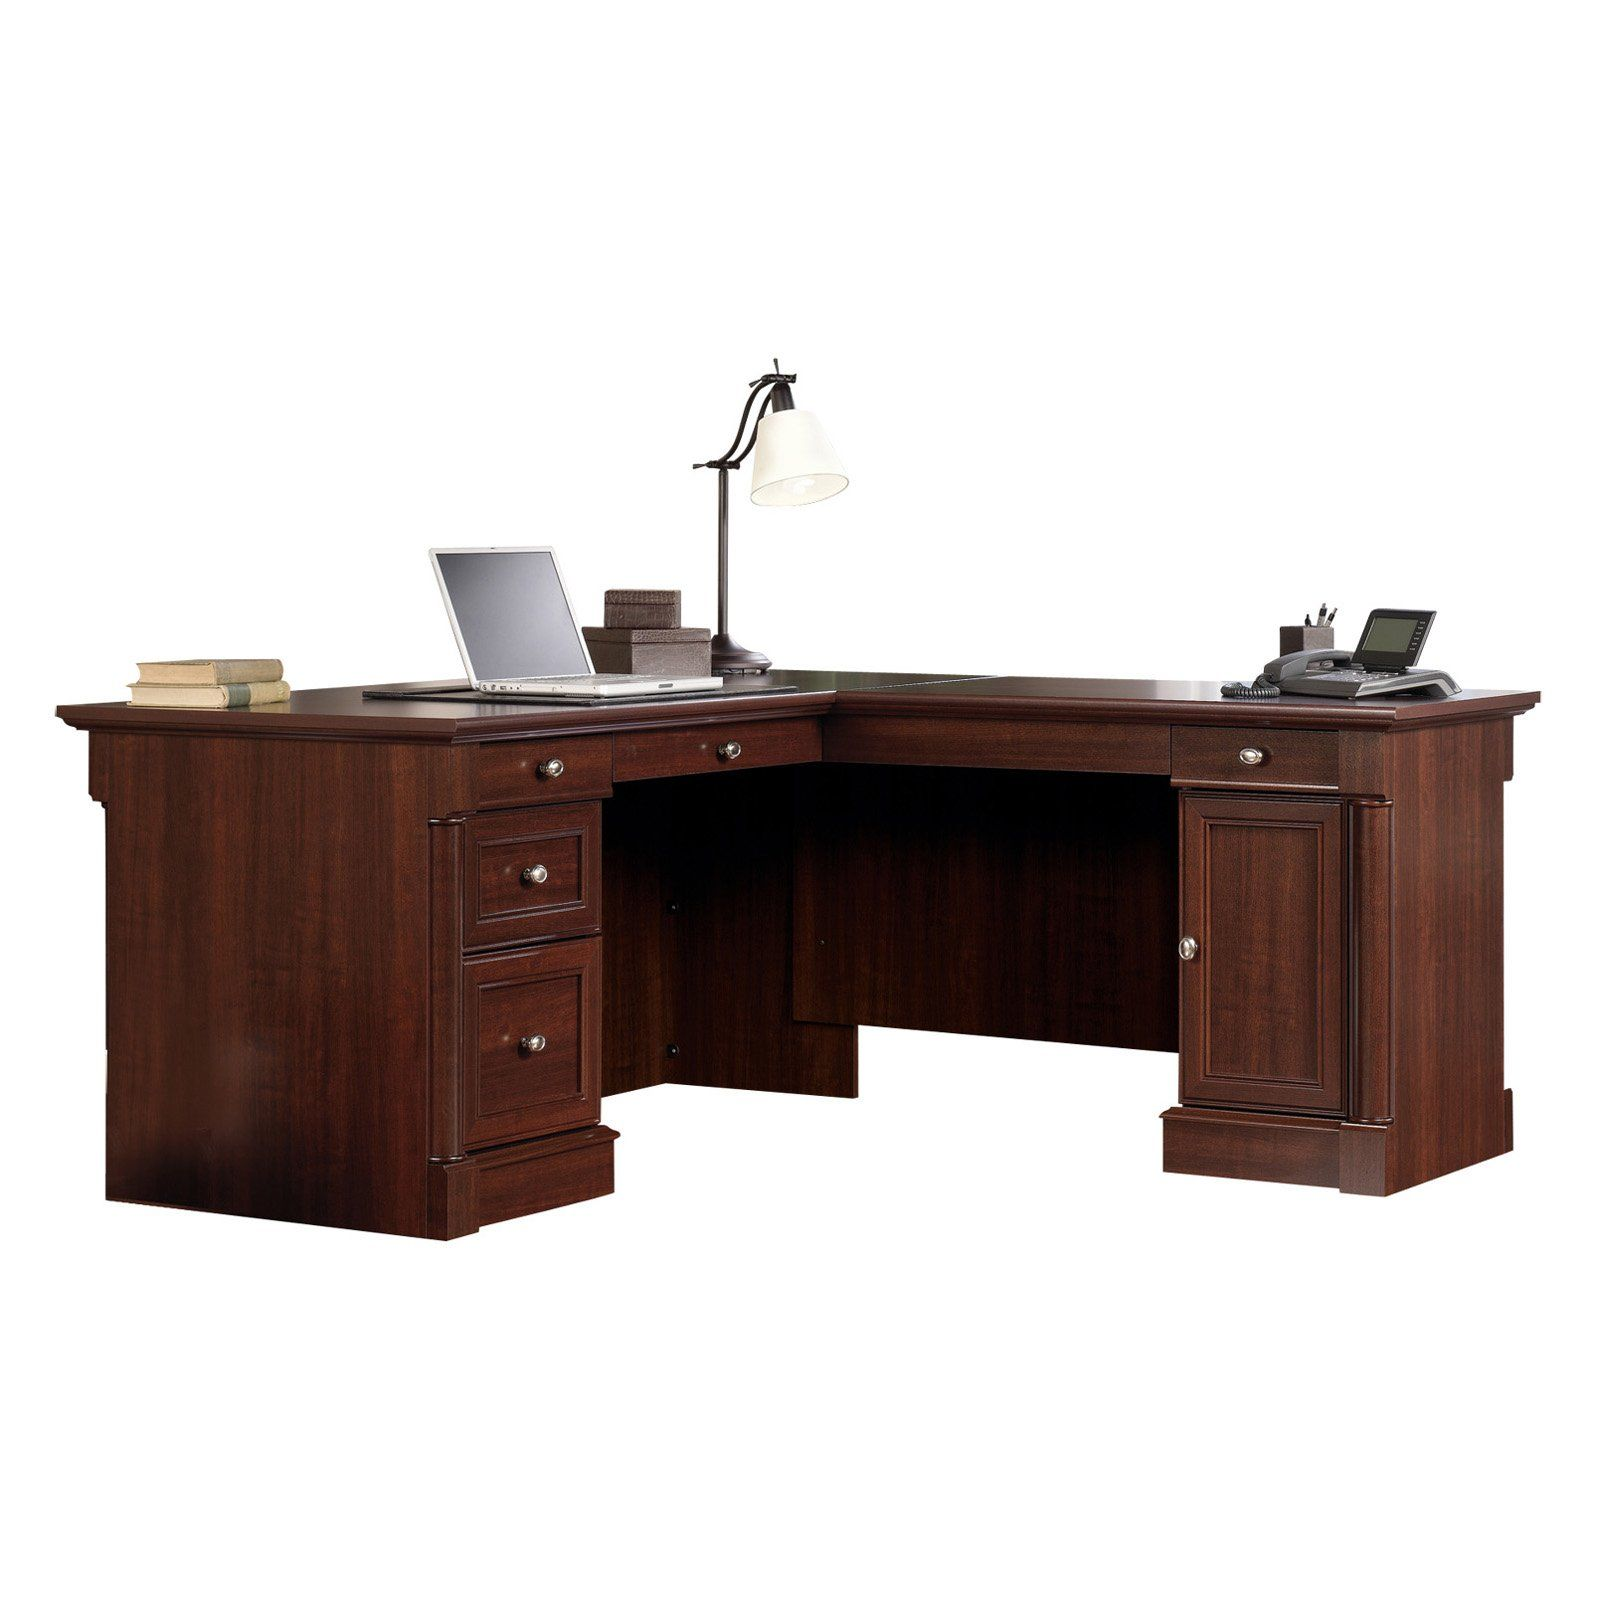 Sauder Palladia L Shaped Desk   Select Cherry $599.99